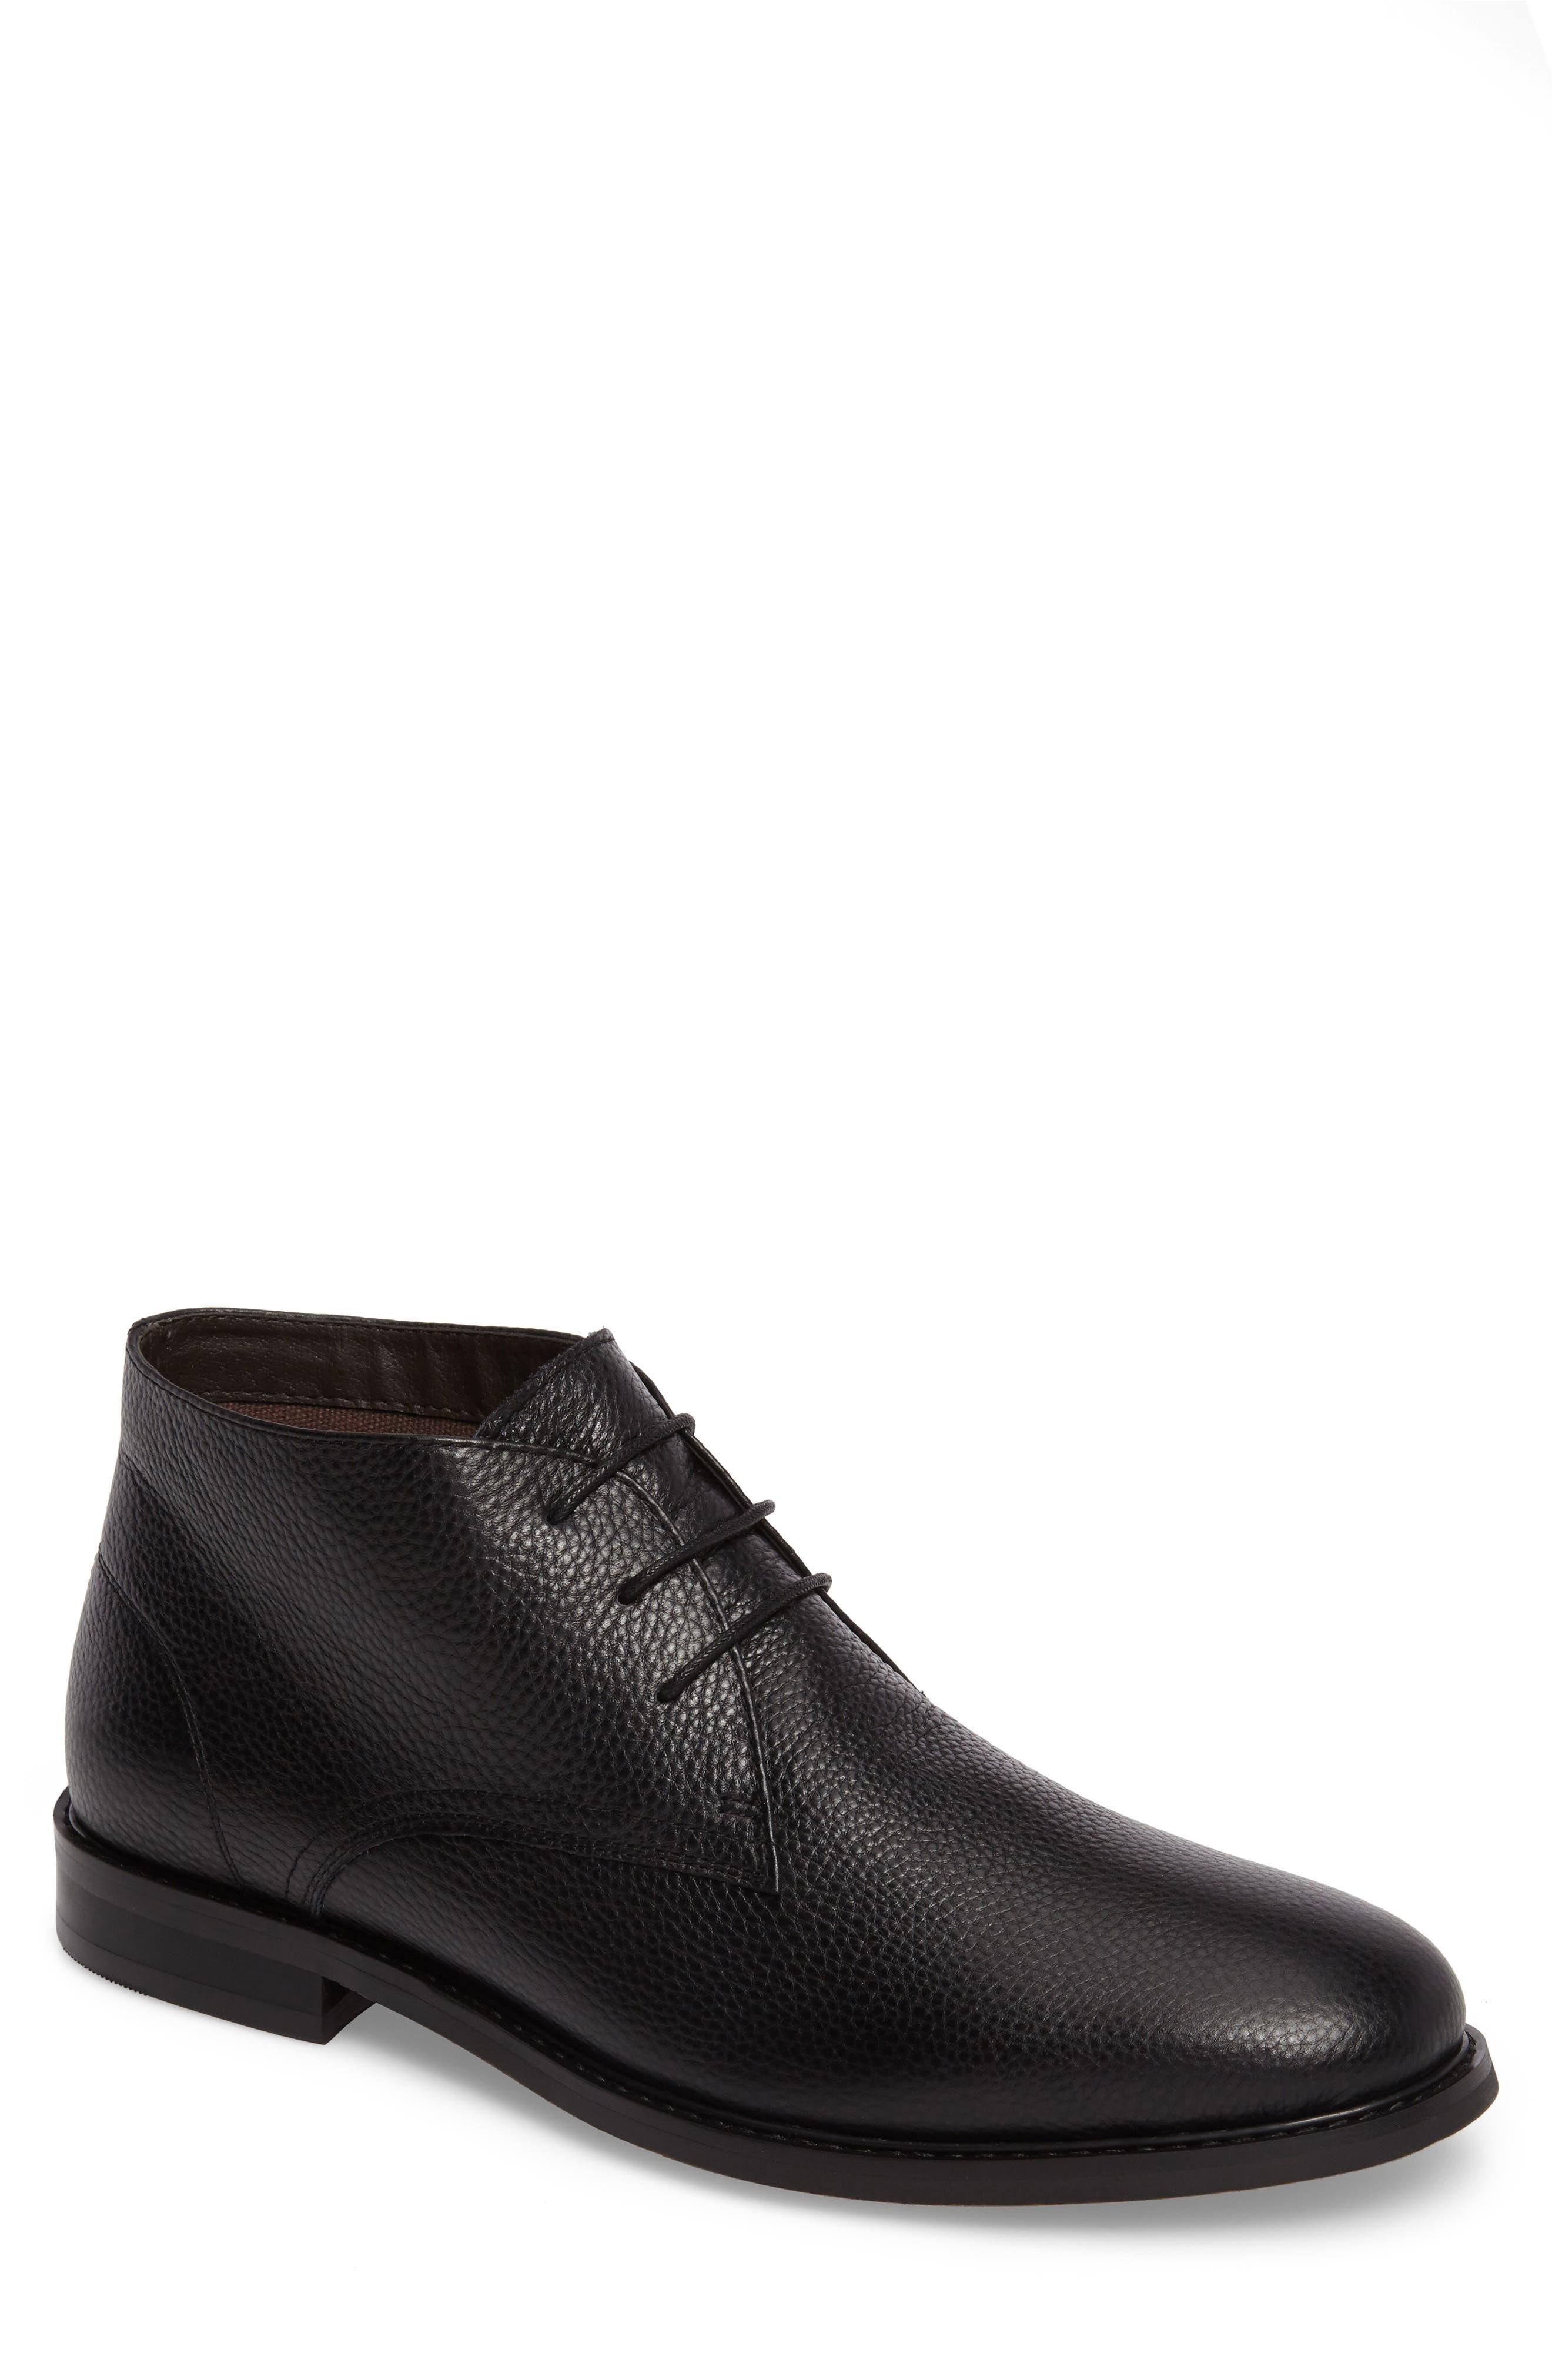 Heyes Chukka Boot,                         Main,                         color,